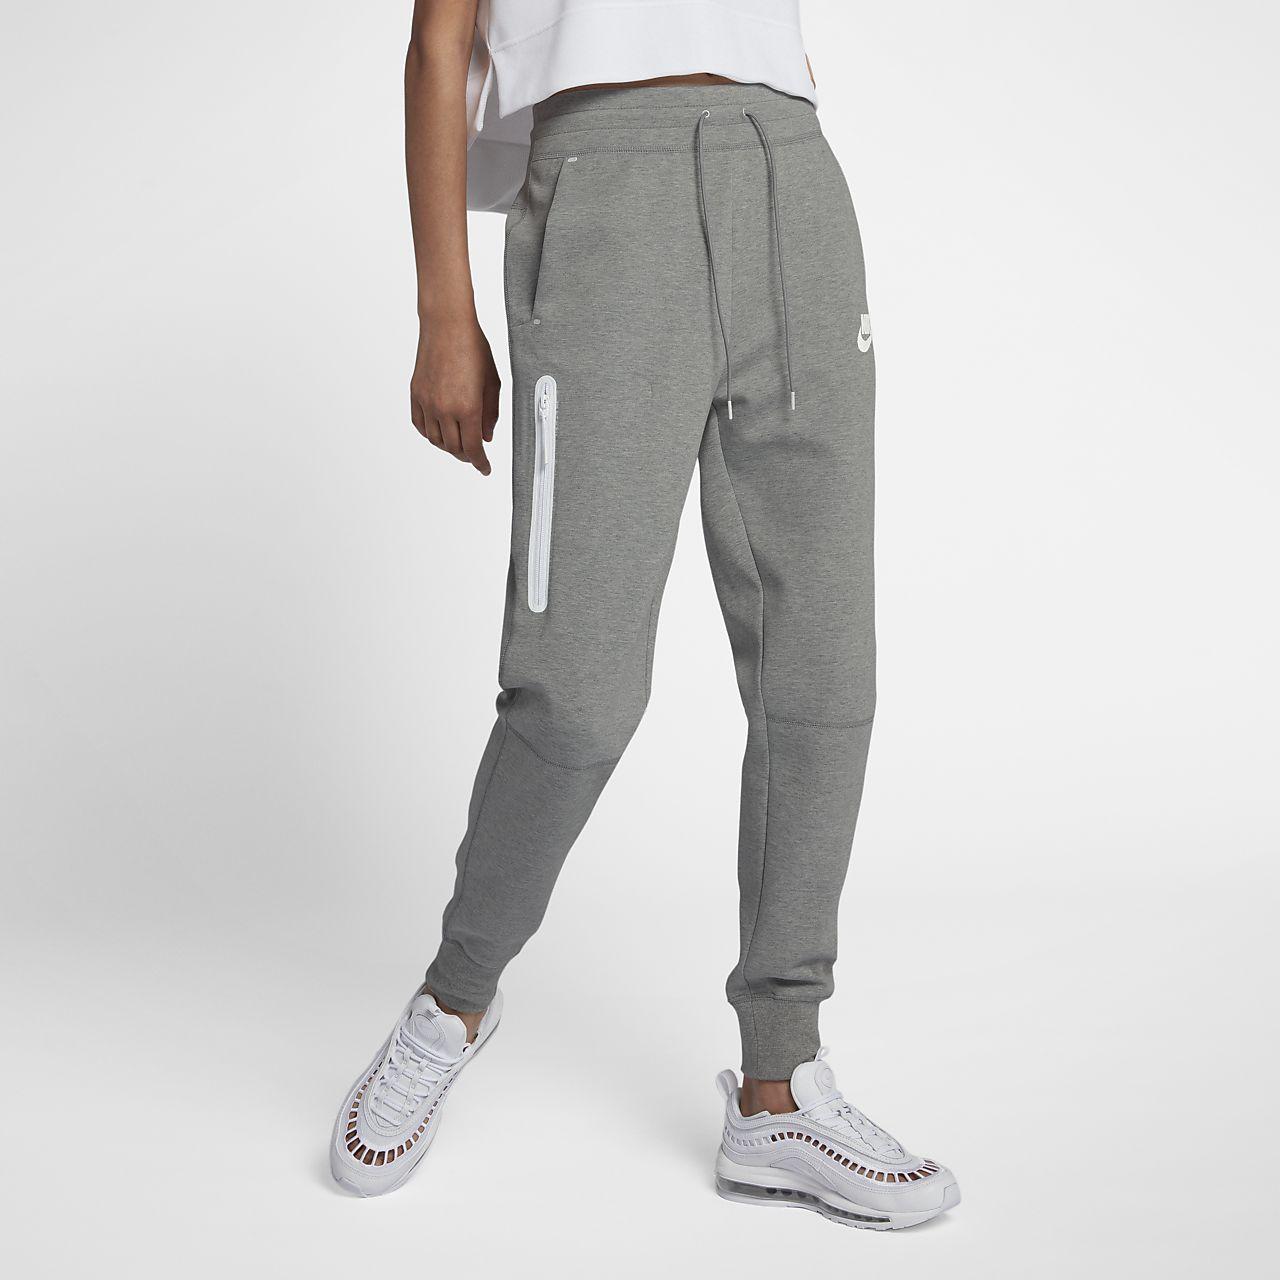 newest 90cb2 7cb4e Pantaloni Nike Sportswear Tech Fleece - Donna